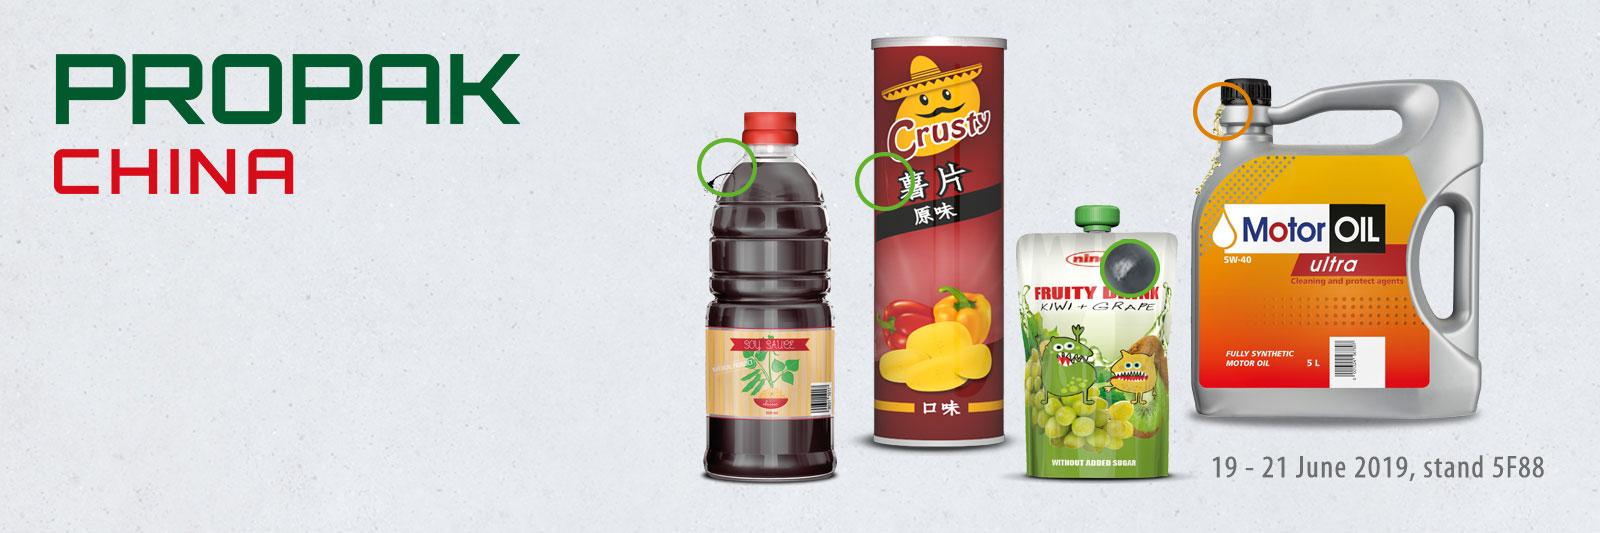 propak-china_2019_v2_title_l.jpg